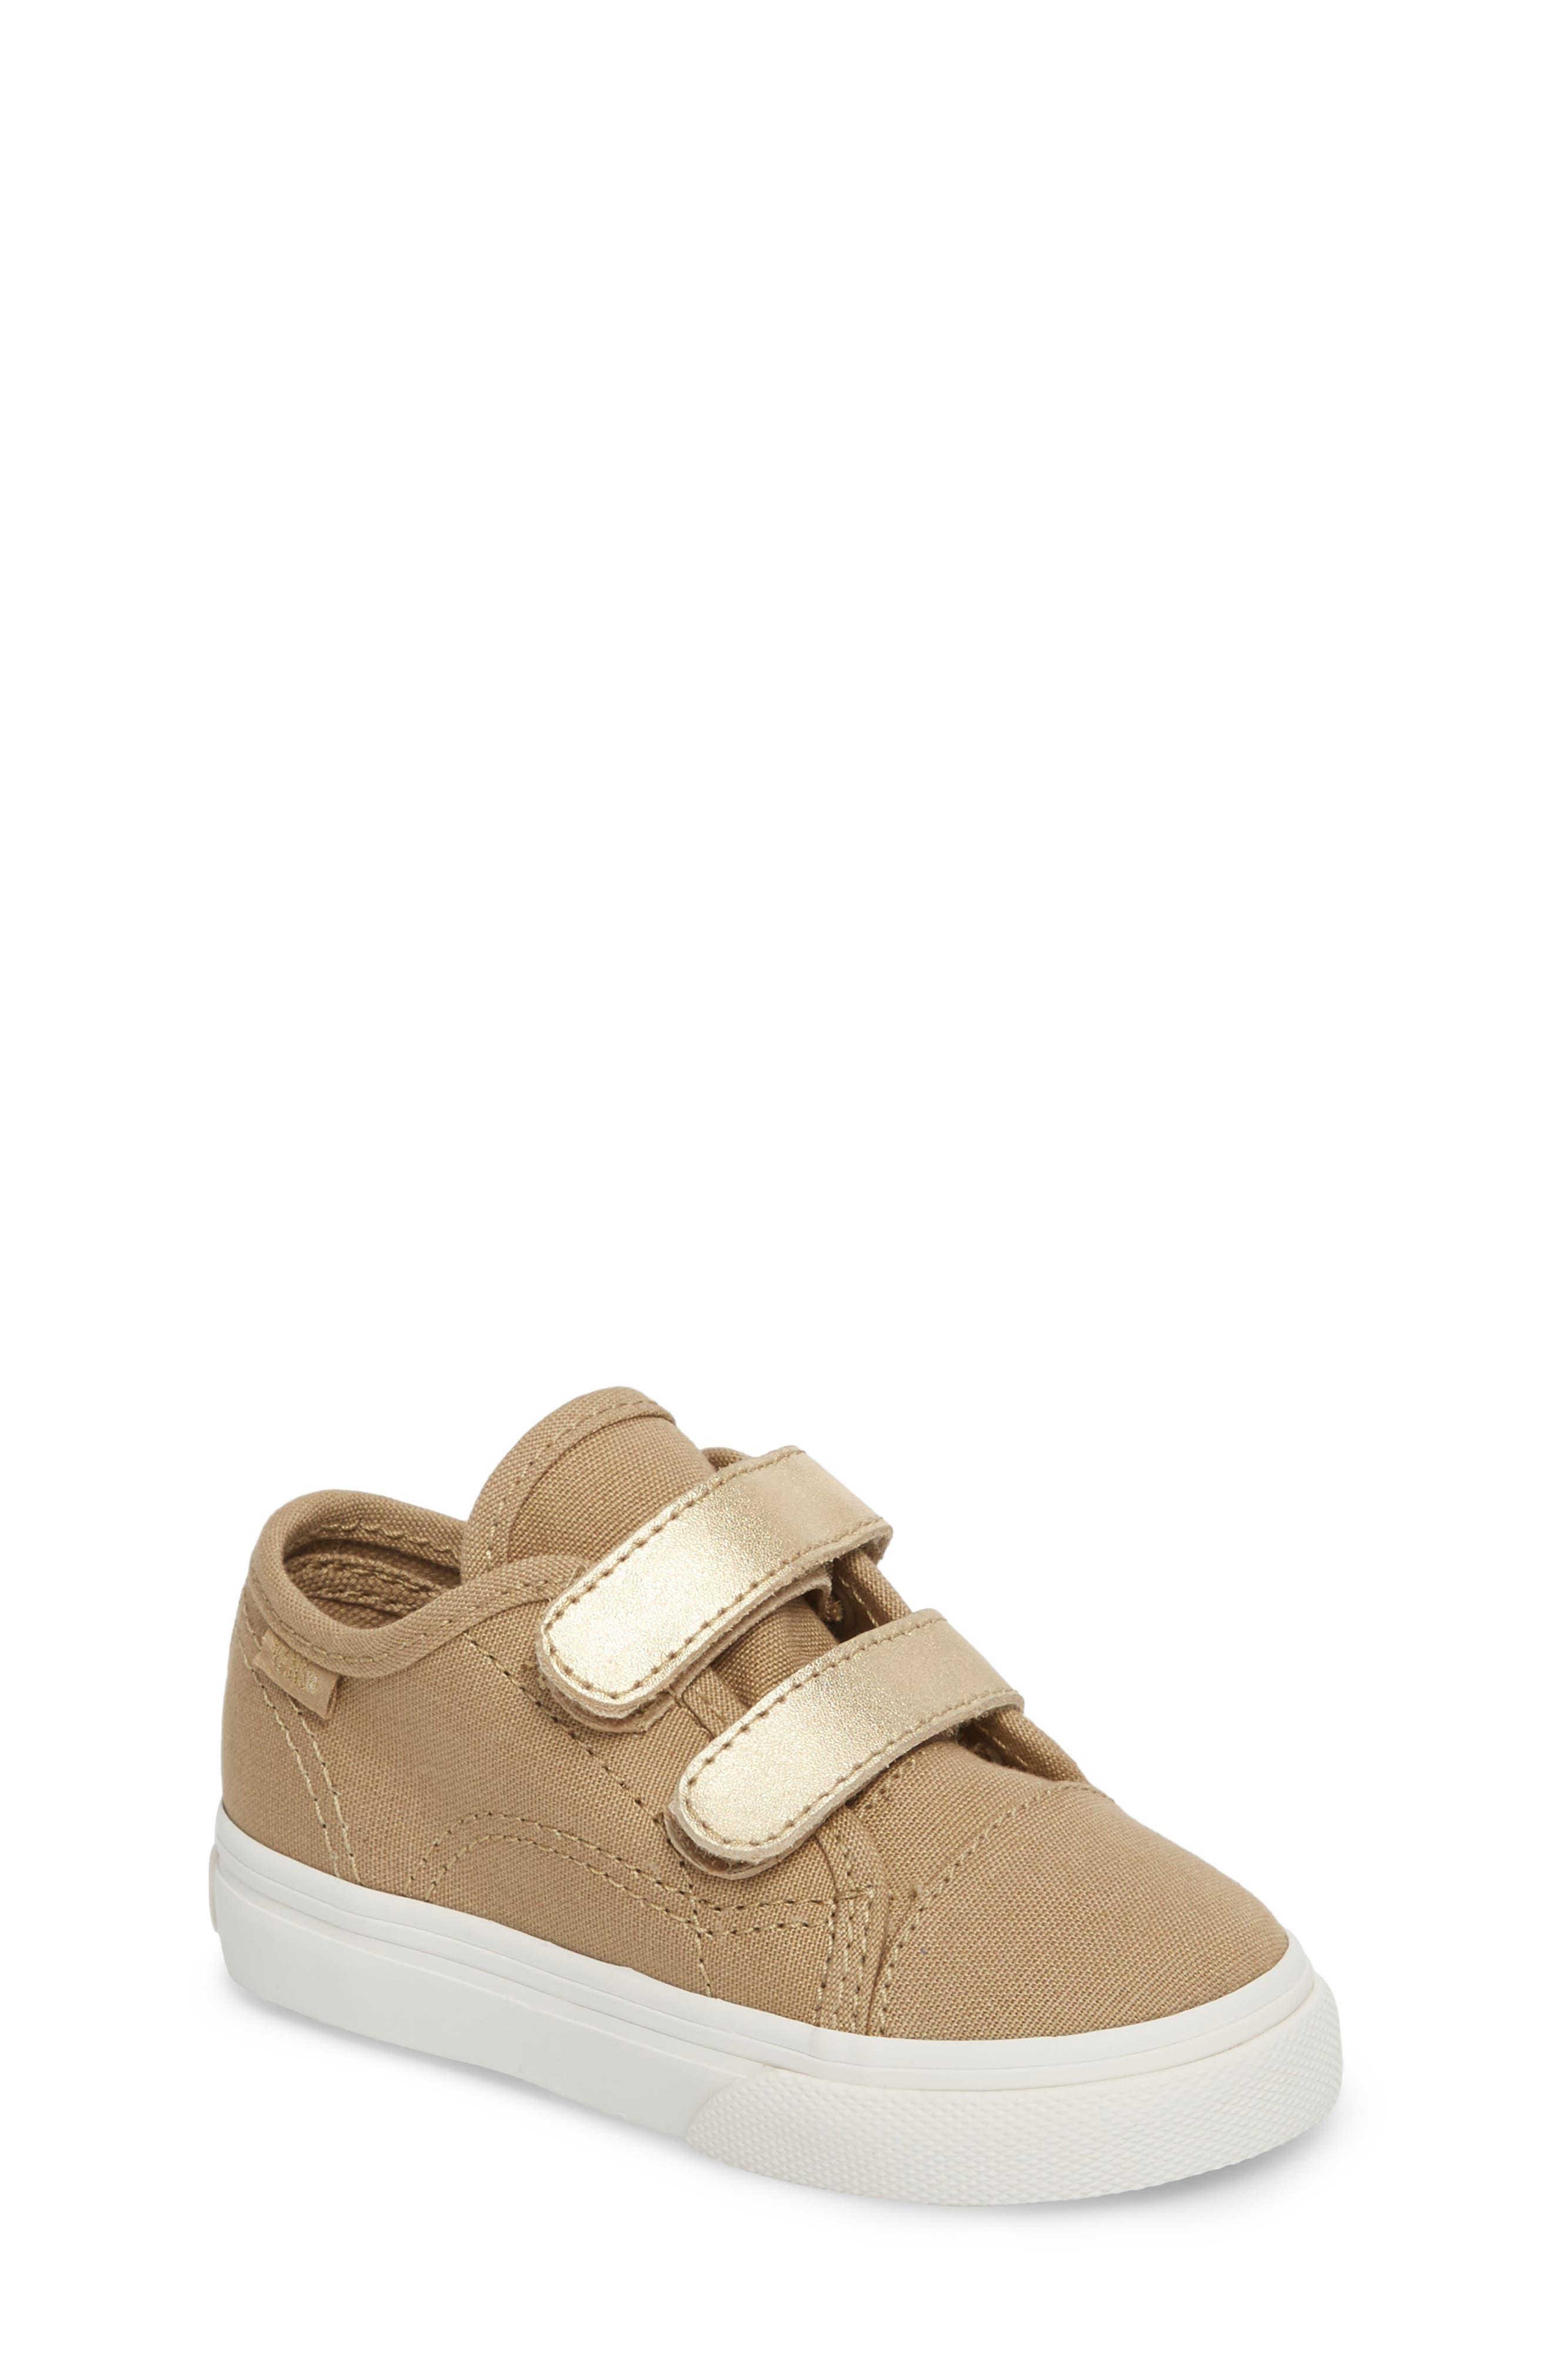 Style 23 V Sneaker,                             Main thumbnail 1, color,                             Metallic/ Cornstalk